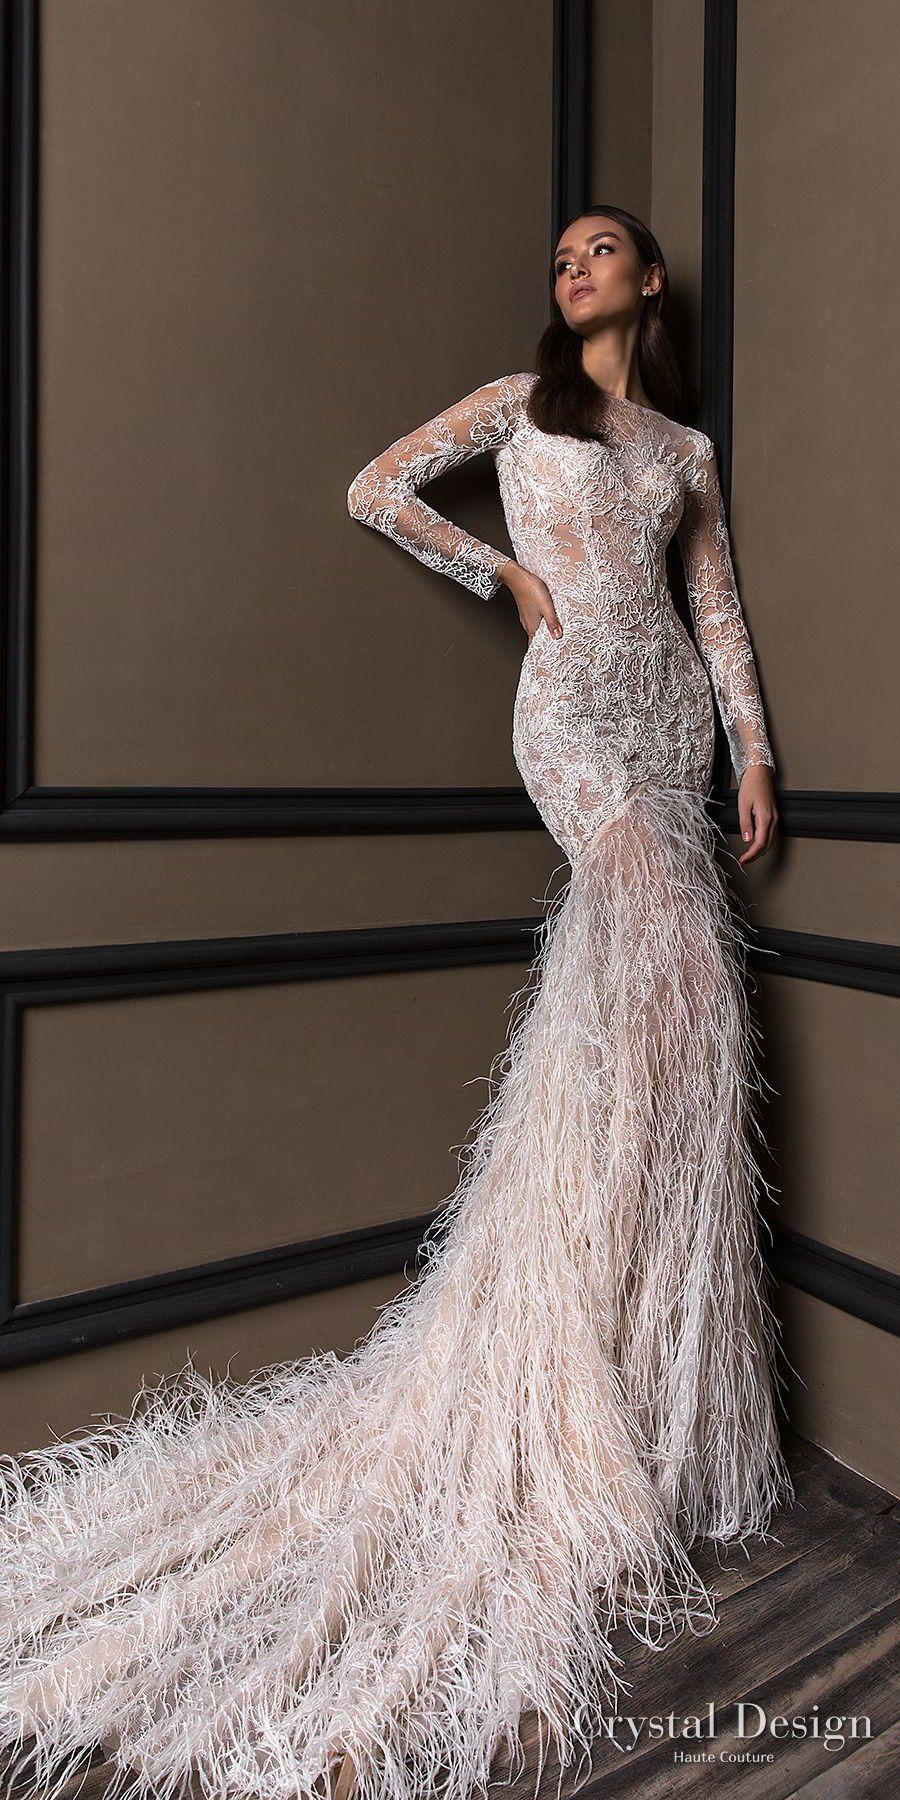 Choosing the perfect wedding dress in the salon Grand openwork